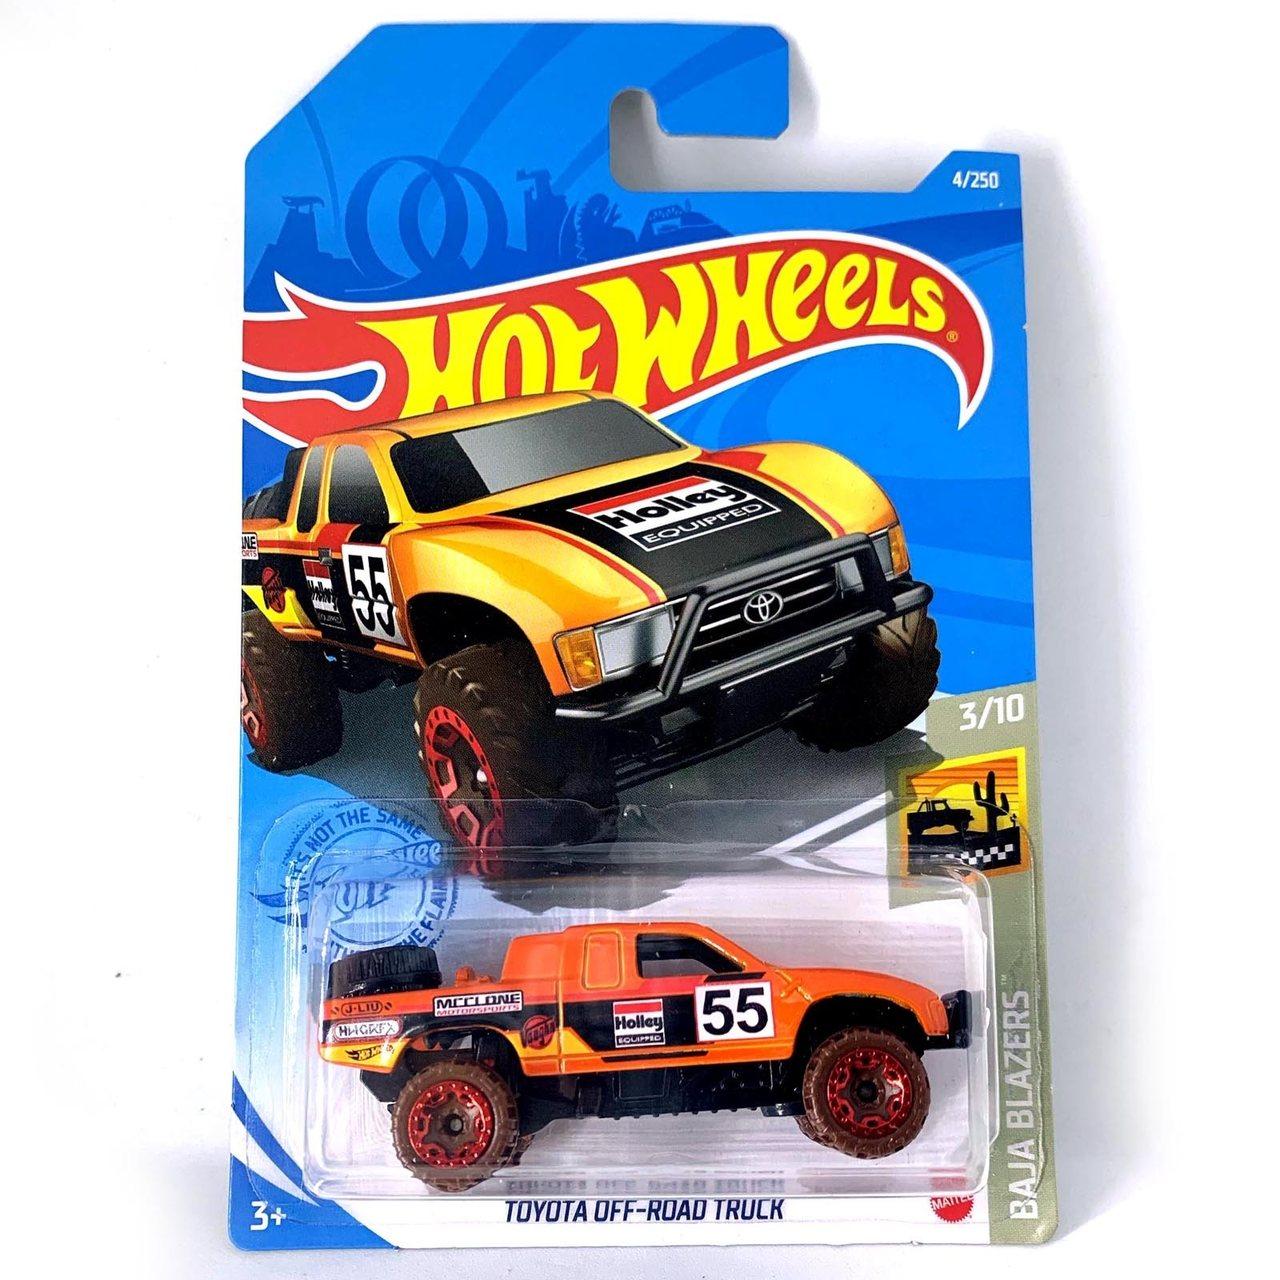 Carrinho Hot Wheels: Toyota Off - Road Truck  Baja Blazers - Mattel